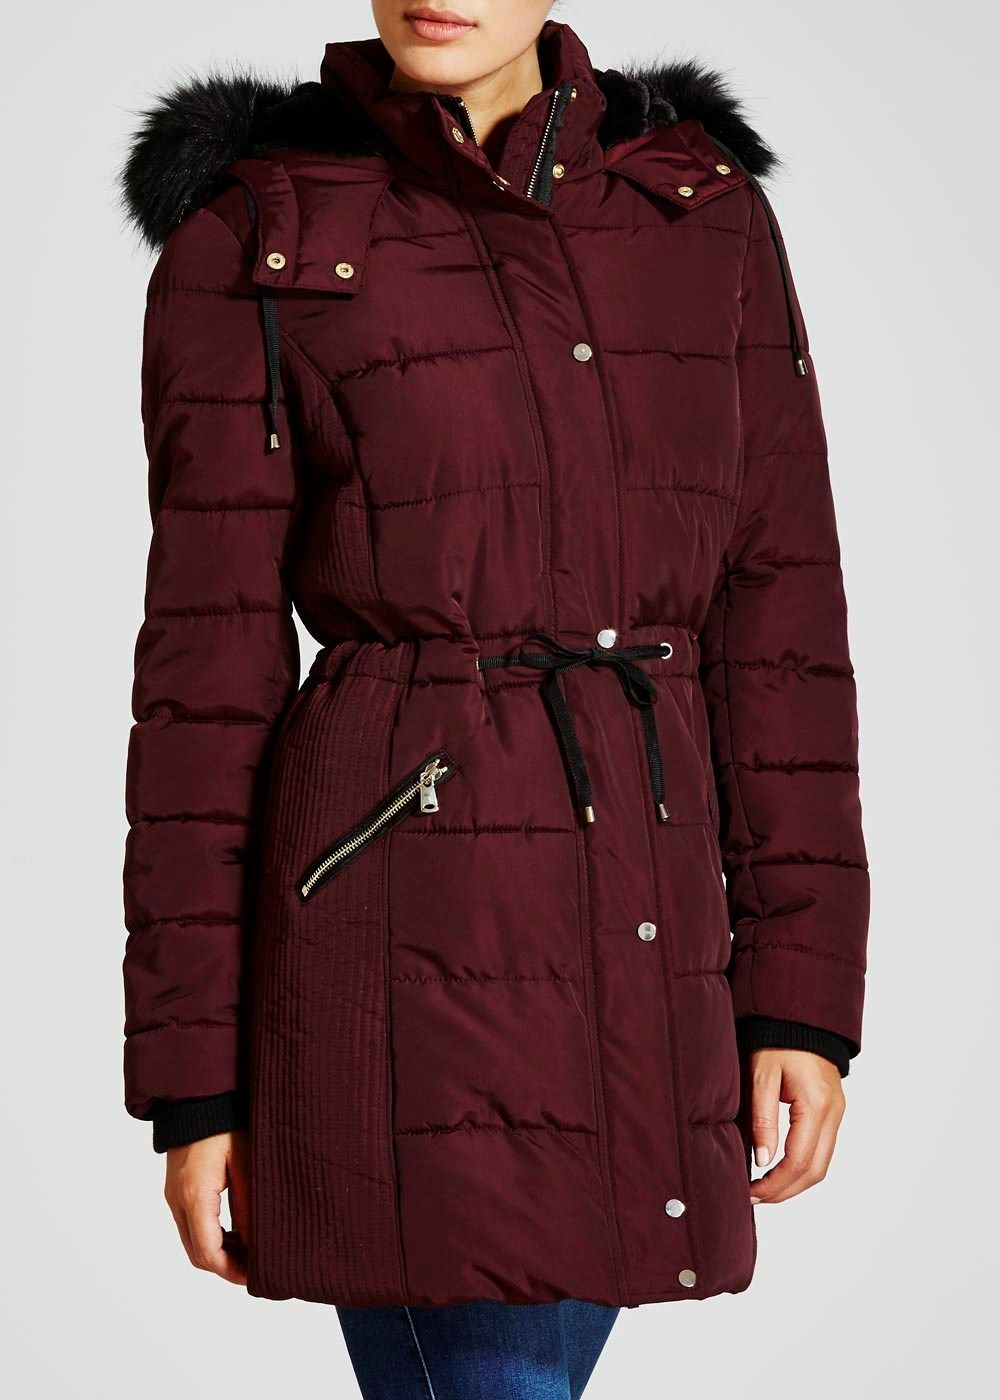 01cf0e79ad79 matalan Long Padded Coat | 2016/17 new season long puffer coats i ...